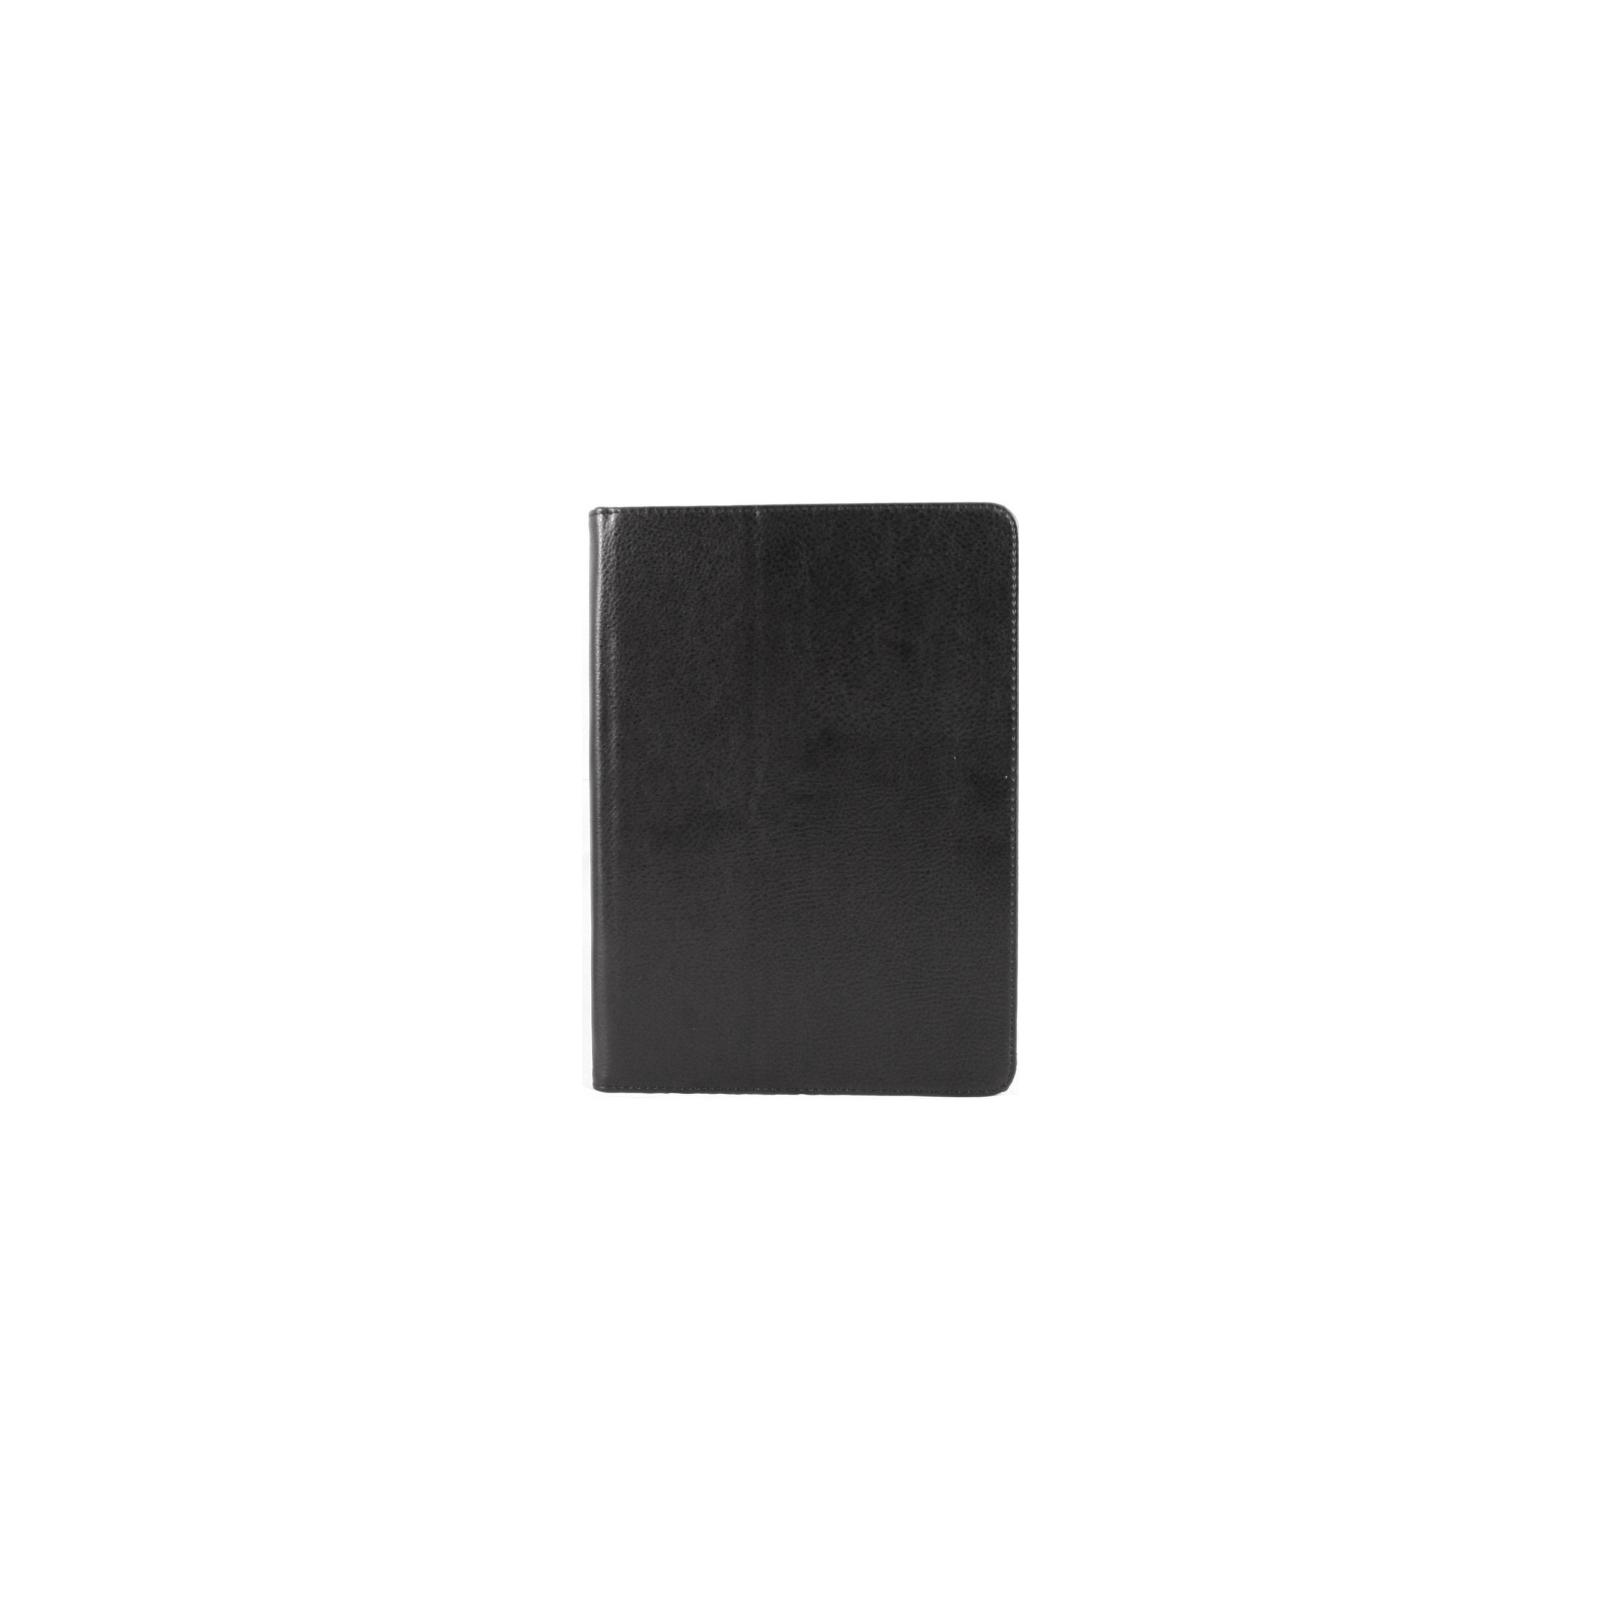 Чехол для планшета Pro-case Asus Memo Pad ME172V (ME172V)